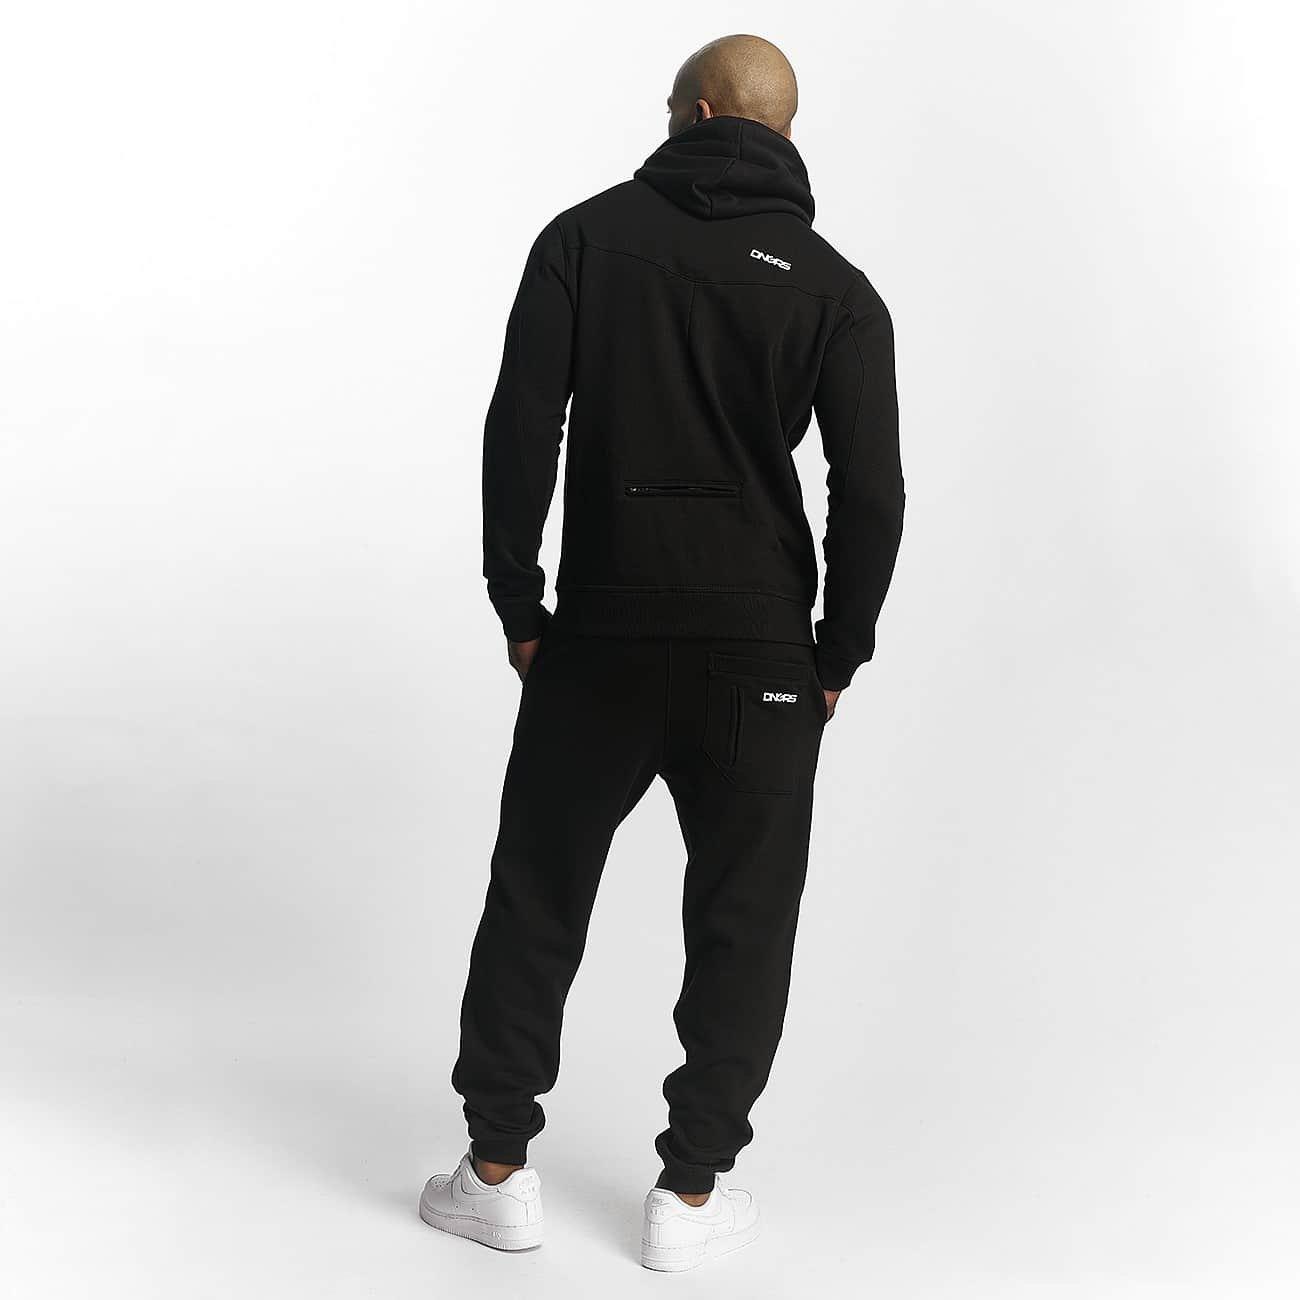 Dangerous DNGRS Herren Jogginganzug Trainingsanzug Basic Basic Trainingsanzug Zweiteiler schwarz f1dc12